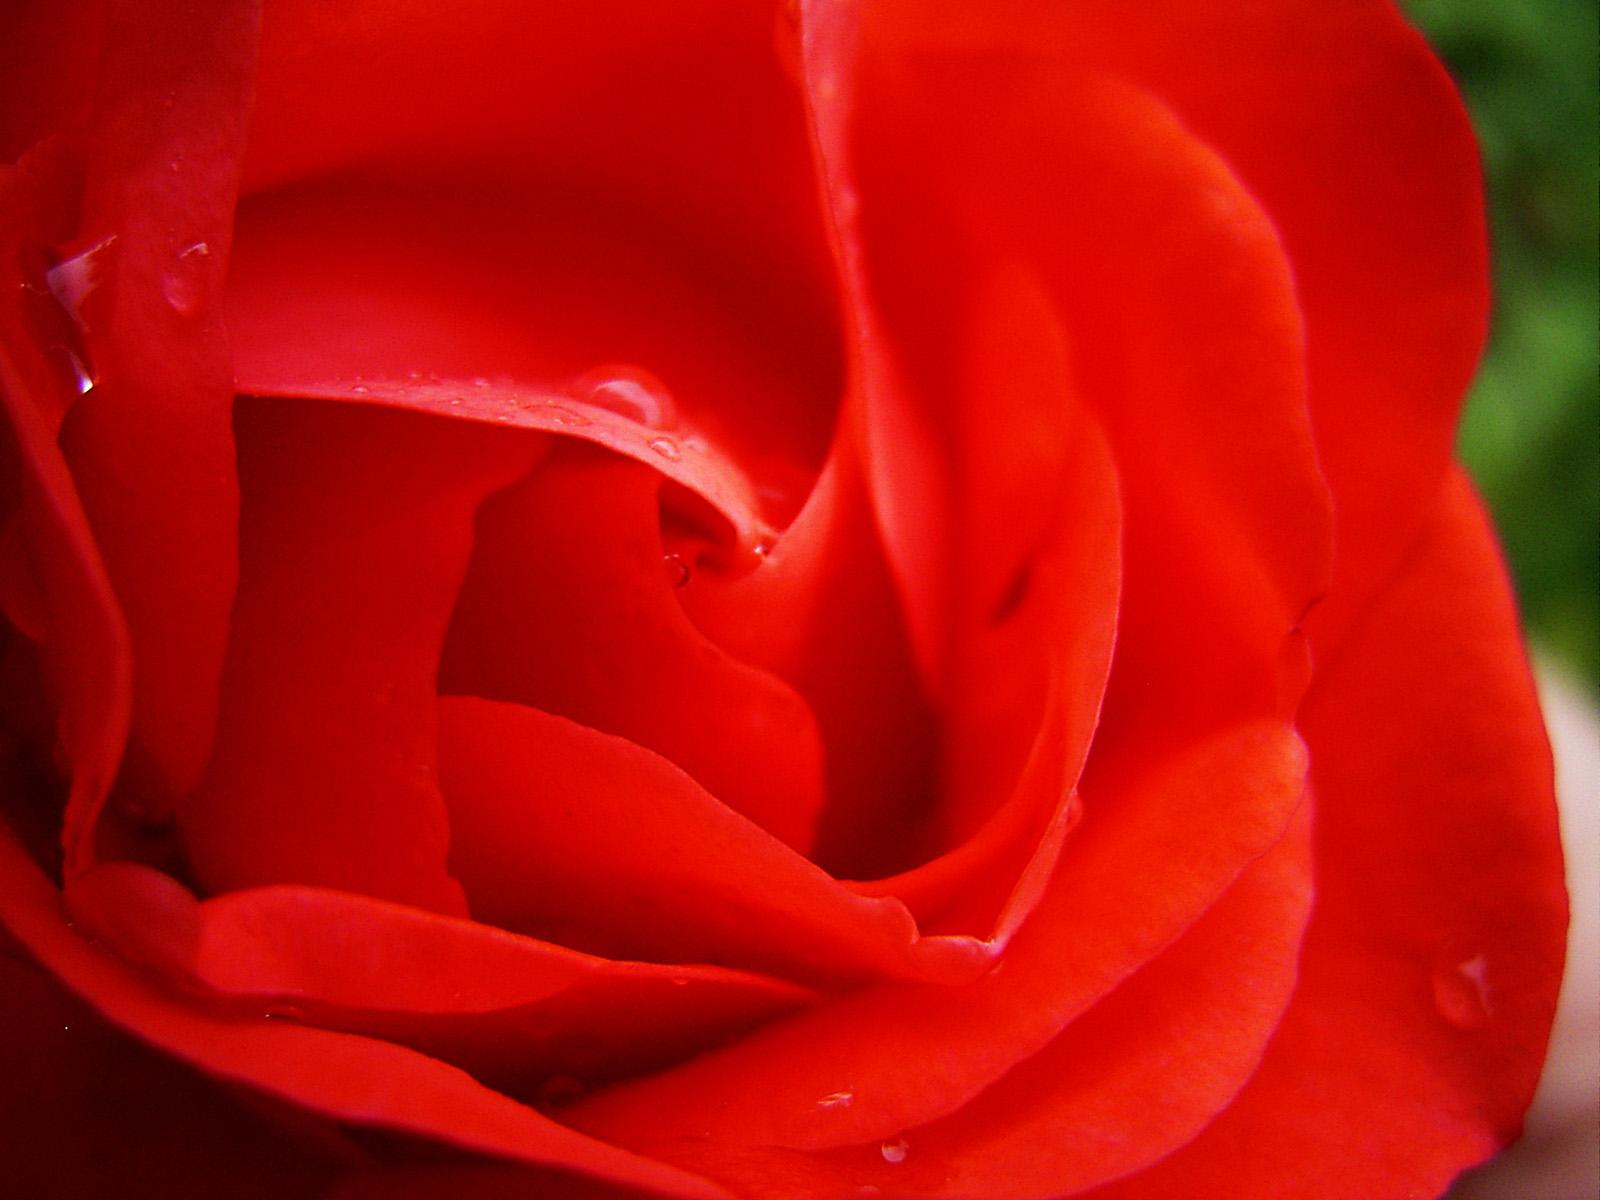 http://1.bp.blogspot.com/-mtNDbTUdxlE/To8ti_P7PDI/AAAAAAAAAgg/Atf6qy_mSi4/s1600/flower008wallpaper.jpg